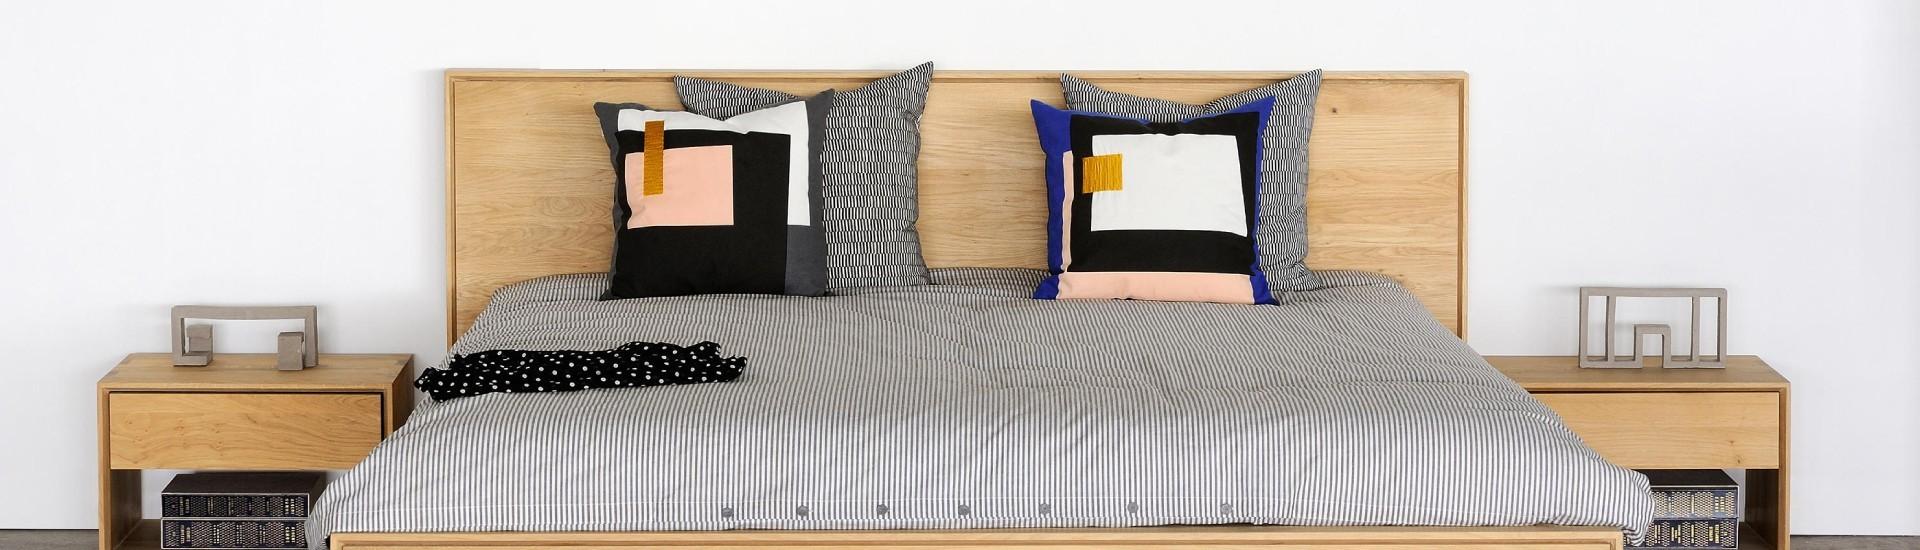 chambre et literie mobilier boutique en ligne ile maurice moodesign ltd. Black Bedroom Furniture Sets. Home Design Ideas